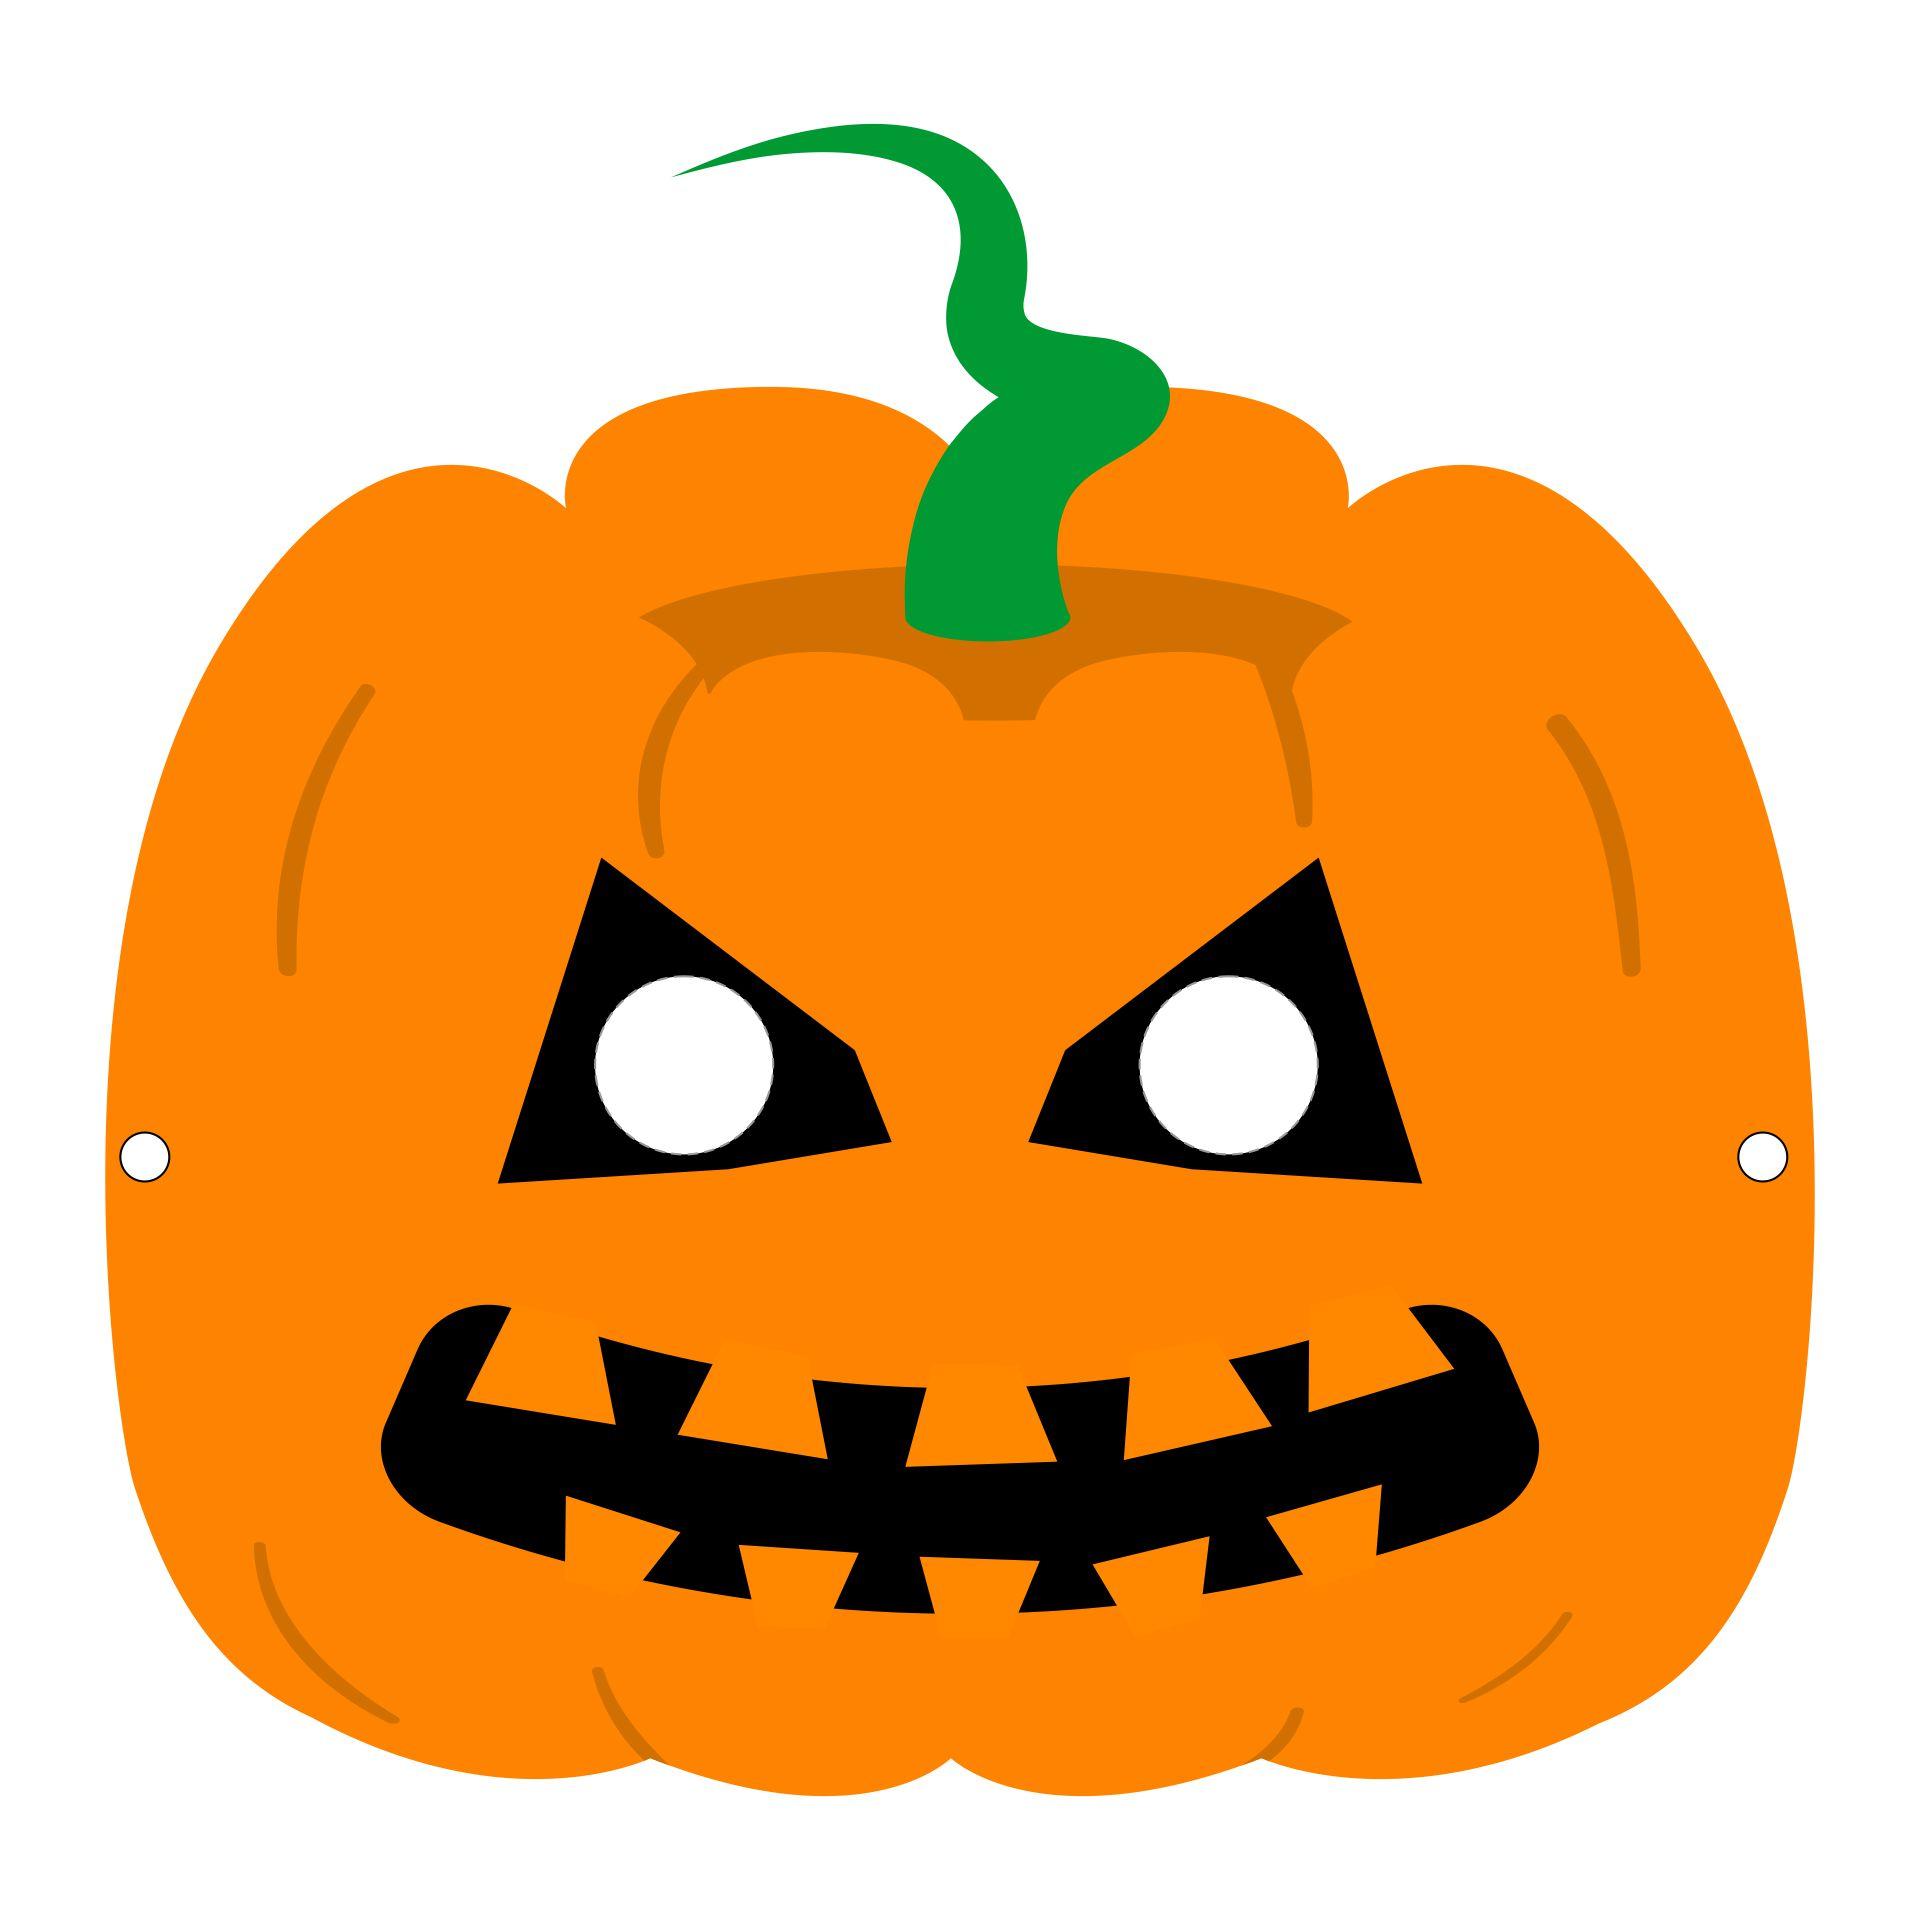 Printable Halloween Pumpkin Craft